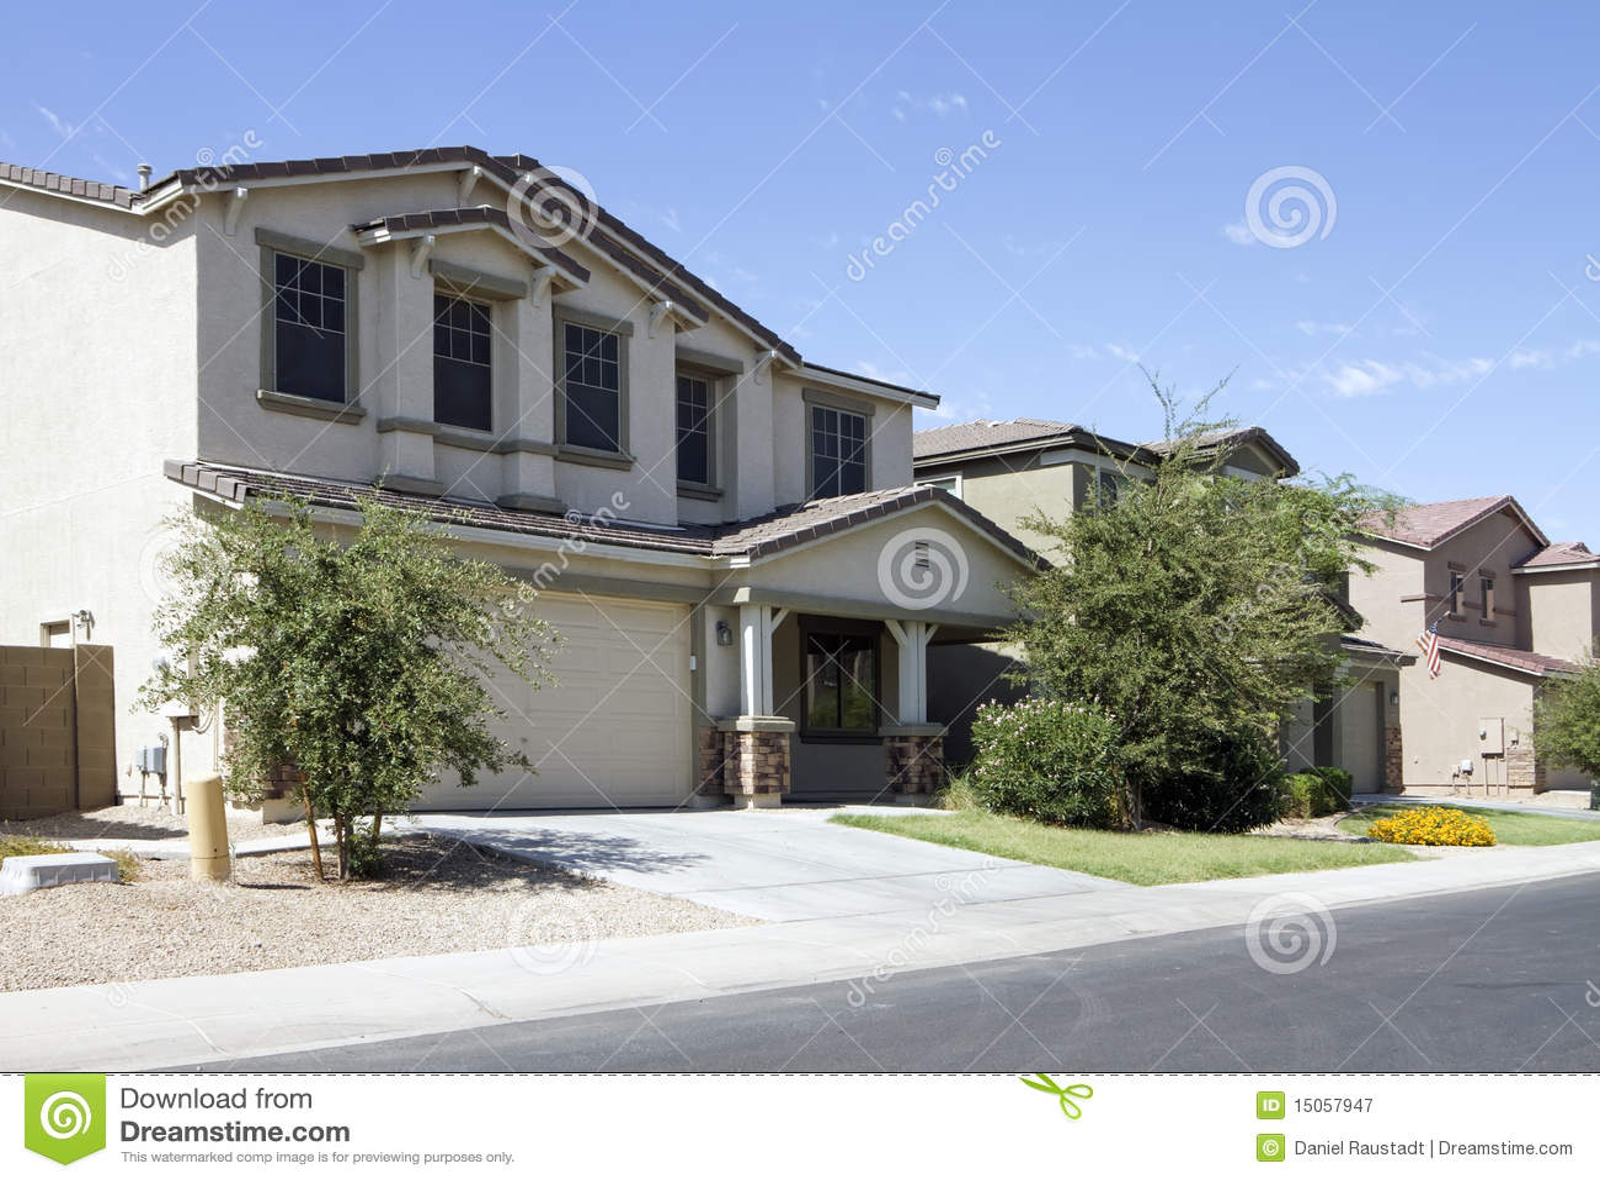 Classic Modern Homes Of New Modern Classic Home Neighborhood Stock Photo